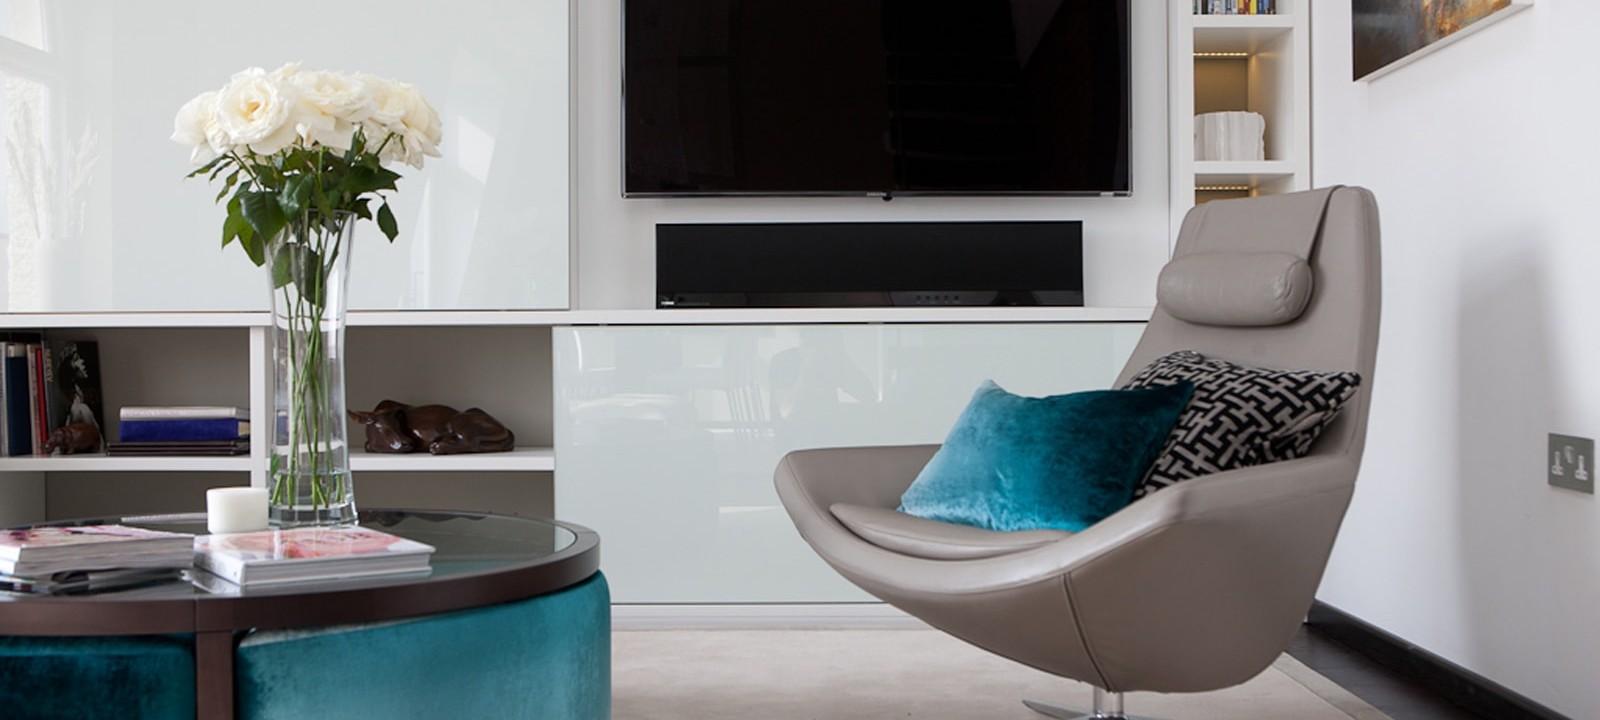 Maida Vale Penthouse Chair